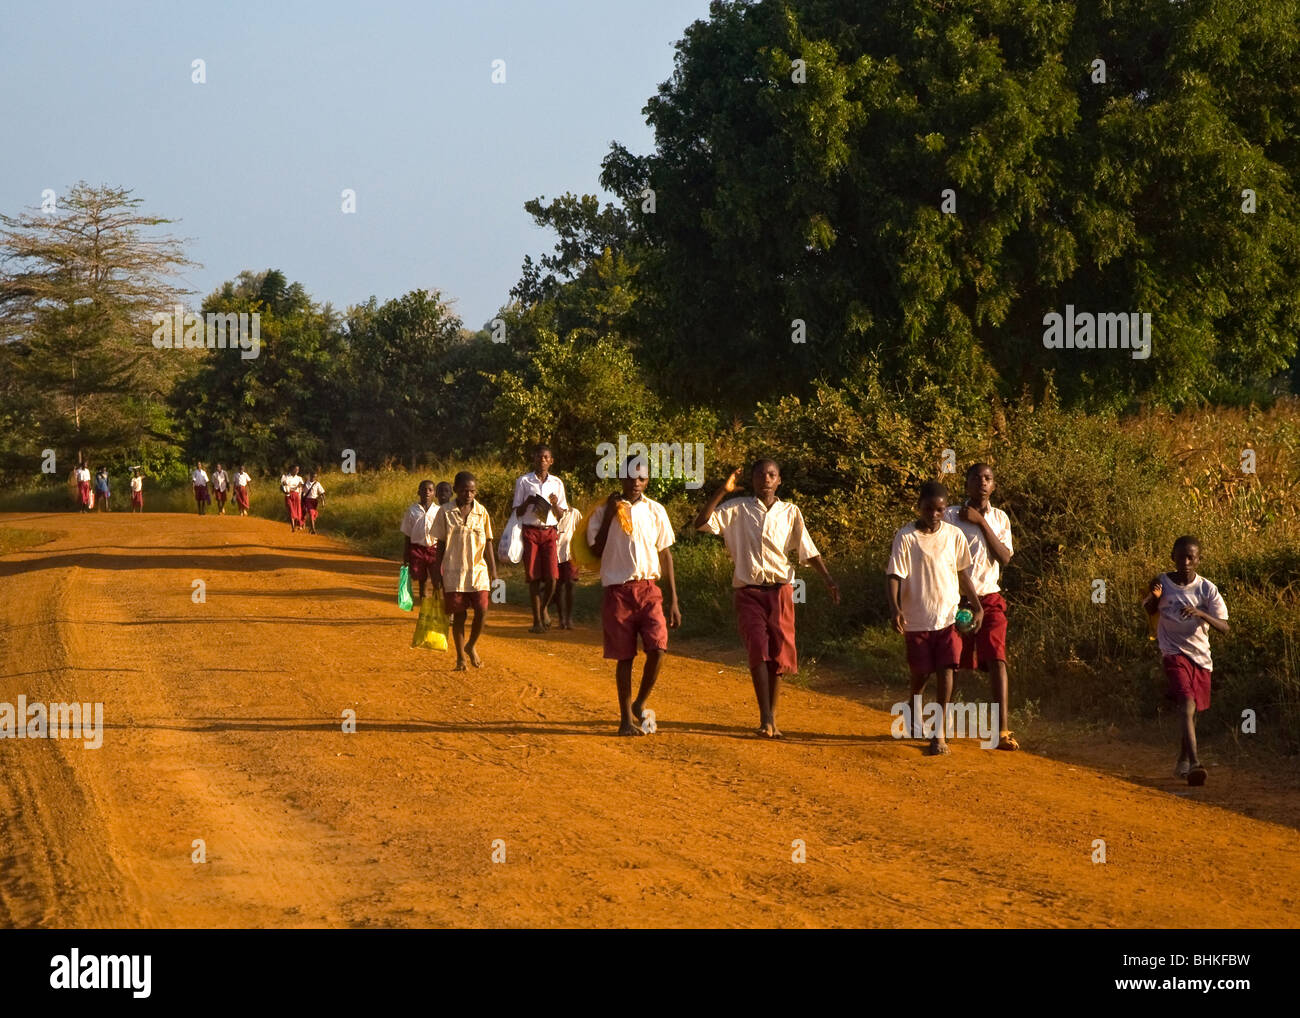 La gente camminare home, Malindi in Kenya, Africa Immagini Stock